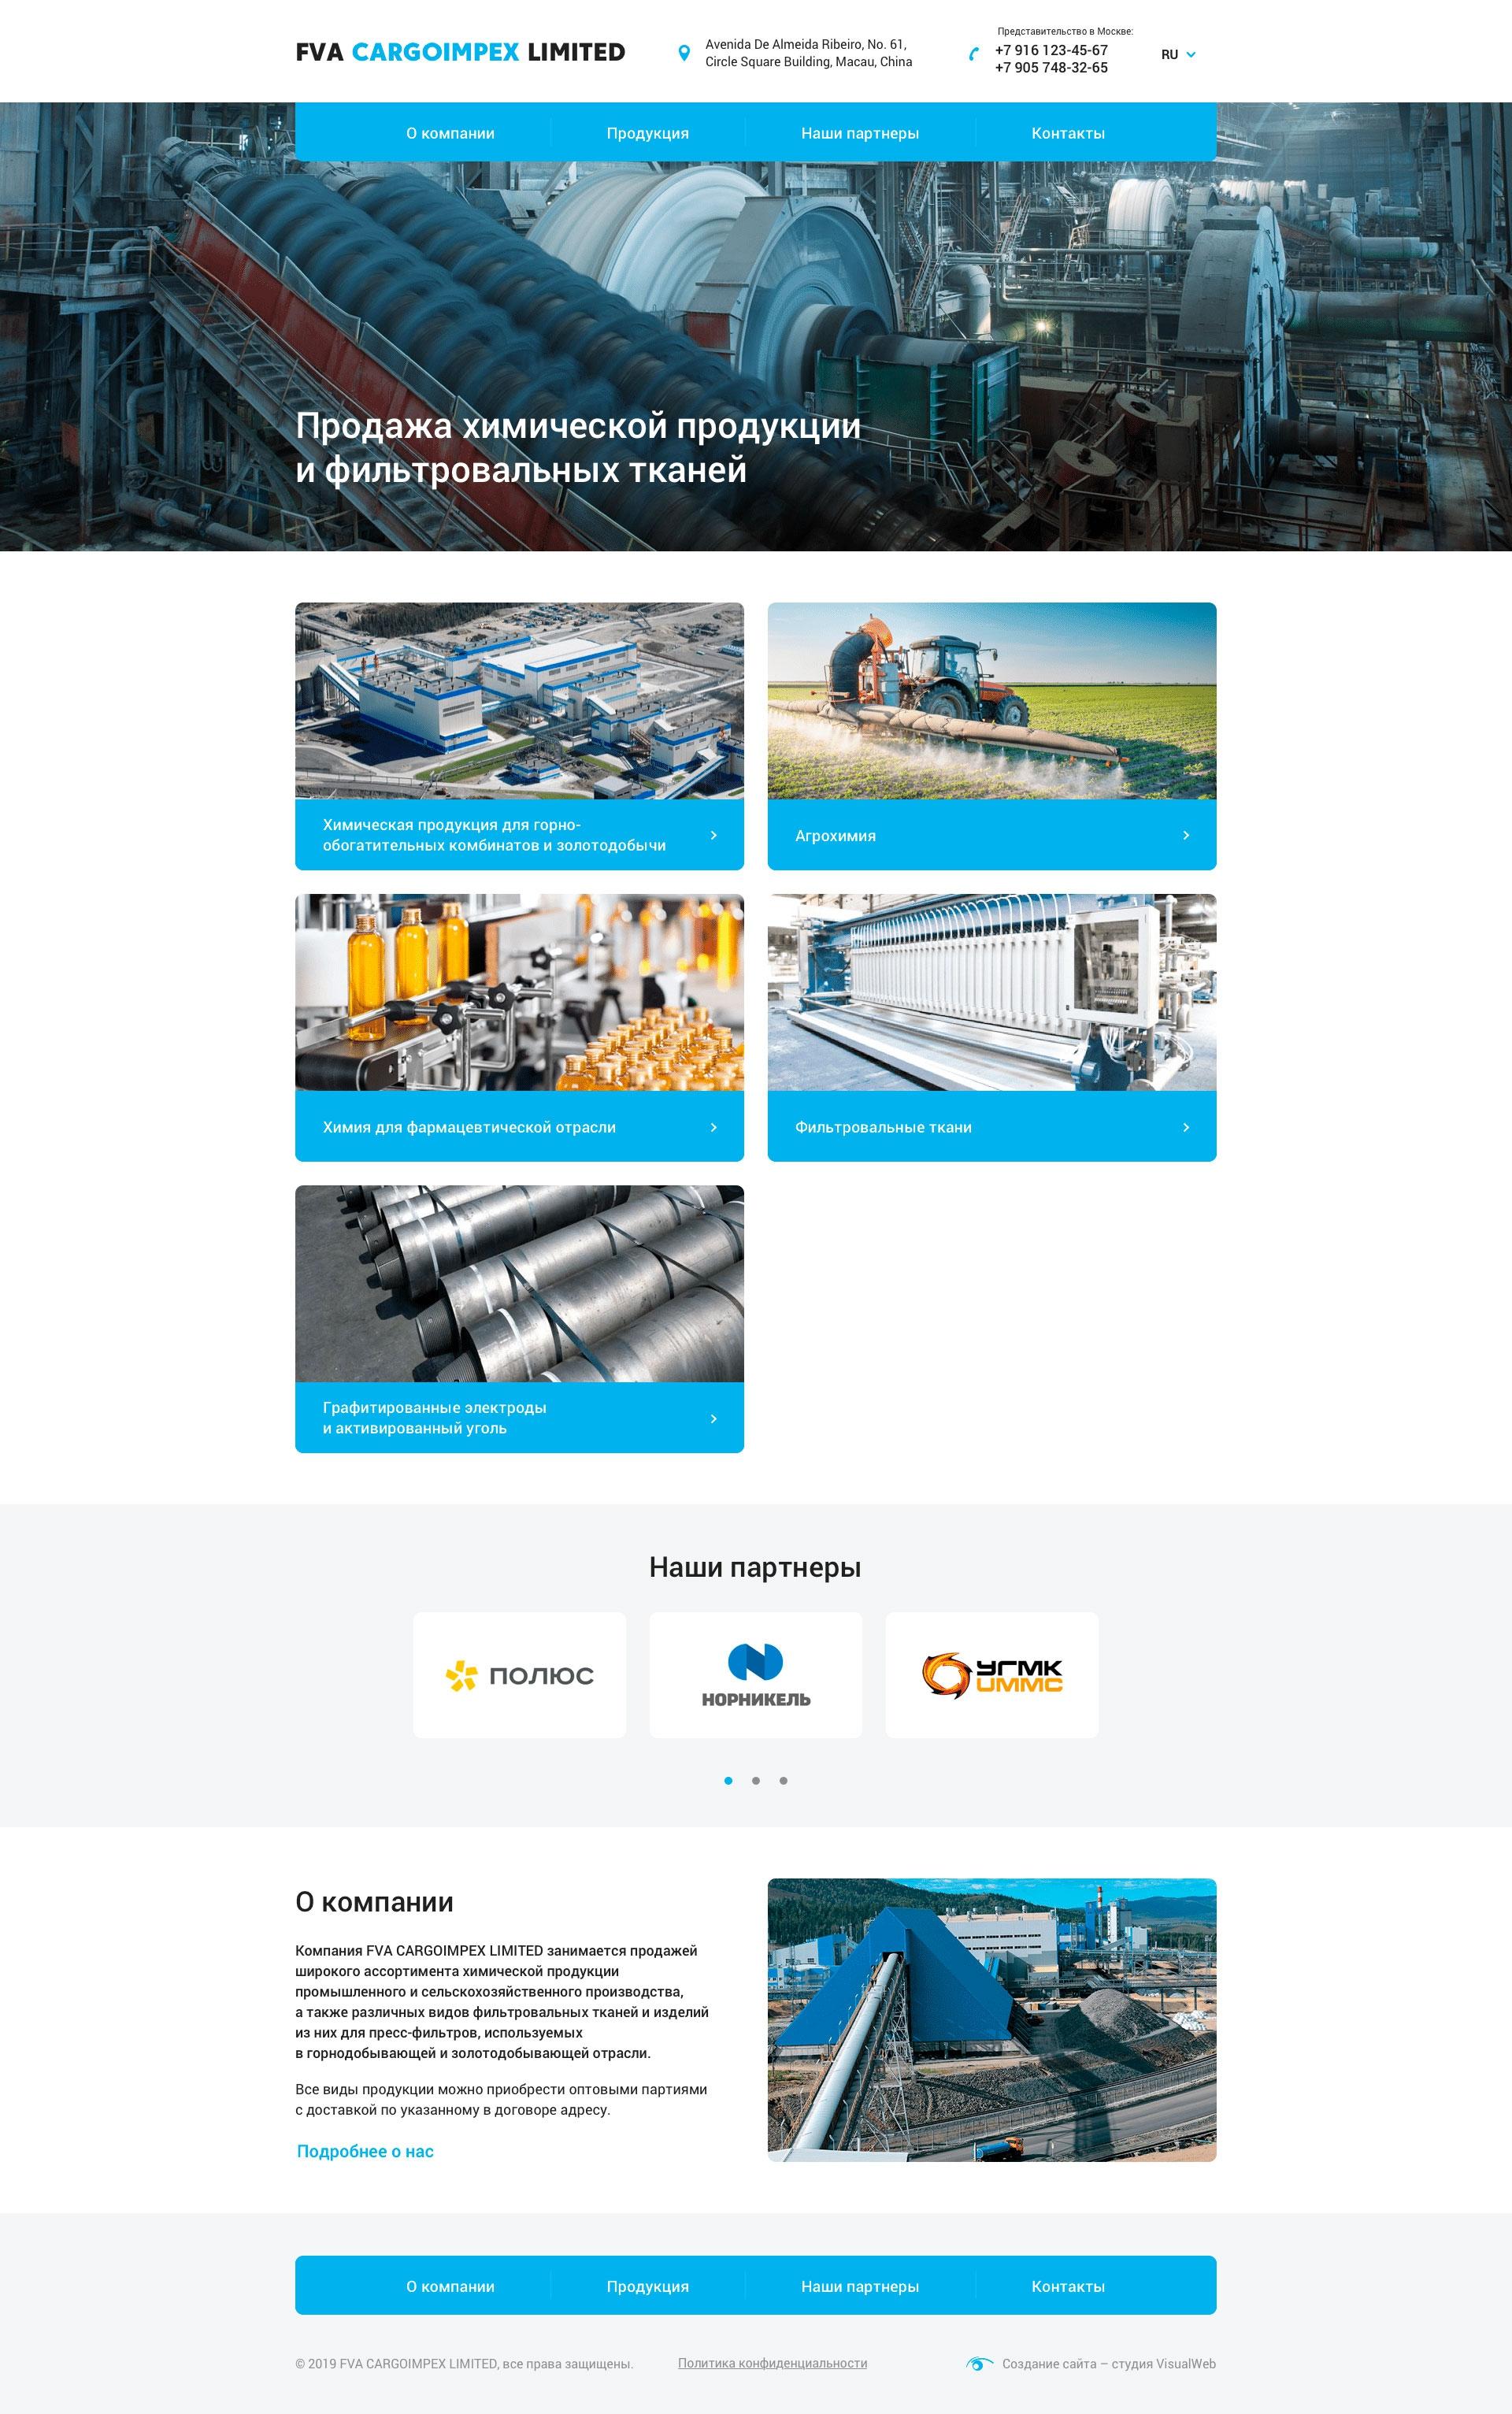 Создание сайта FVA Cargoimpex limited